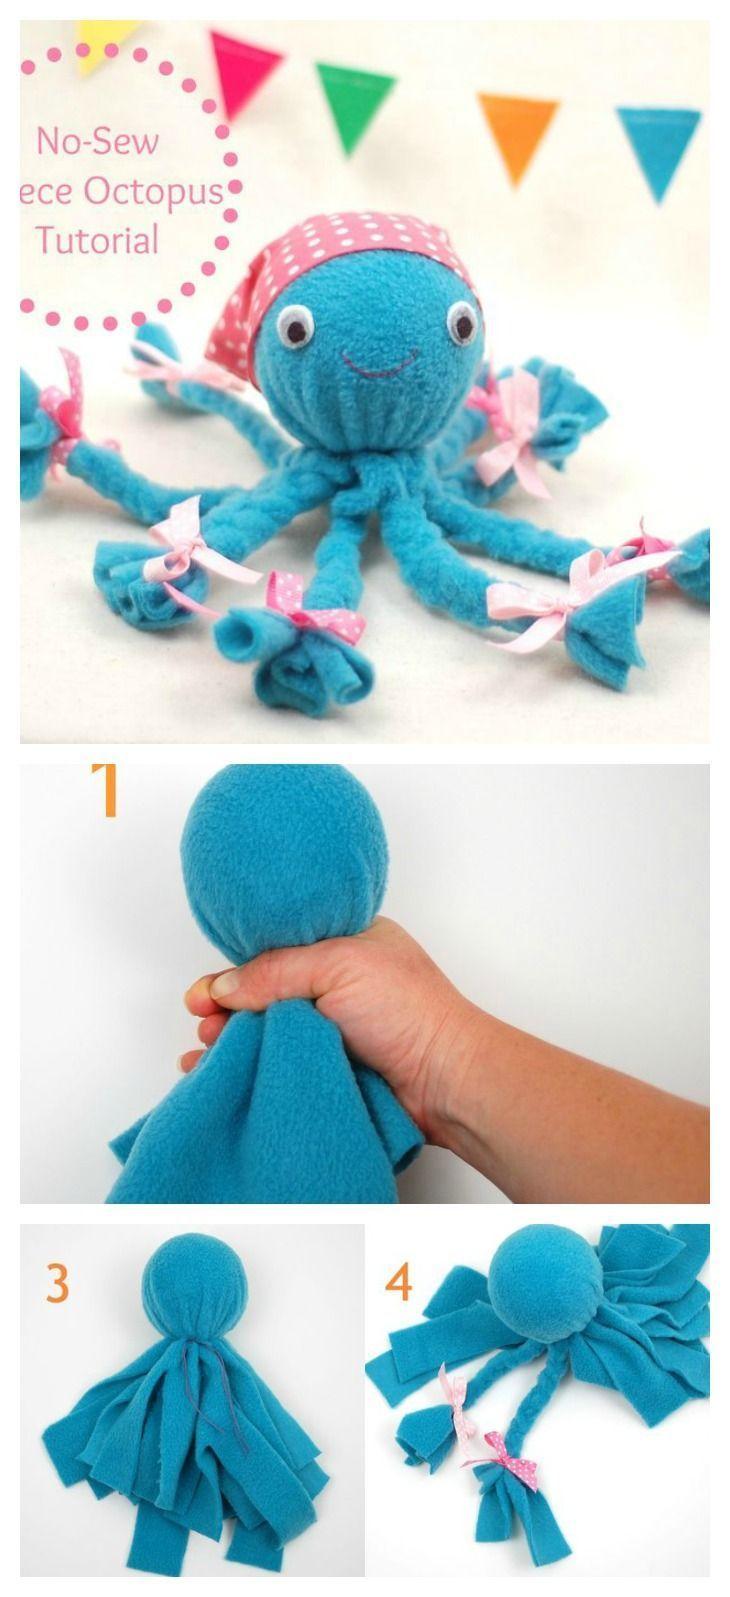 DIY Craft: This DIY No-Sew Fleece Octopus Craft is so cute! I think girl will love it.